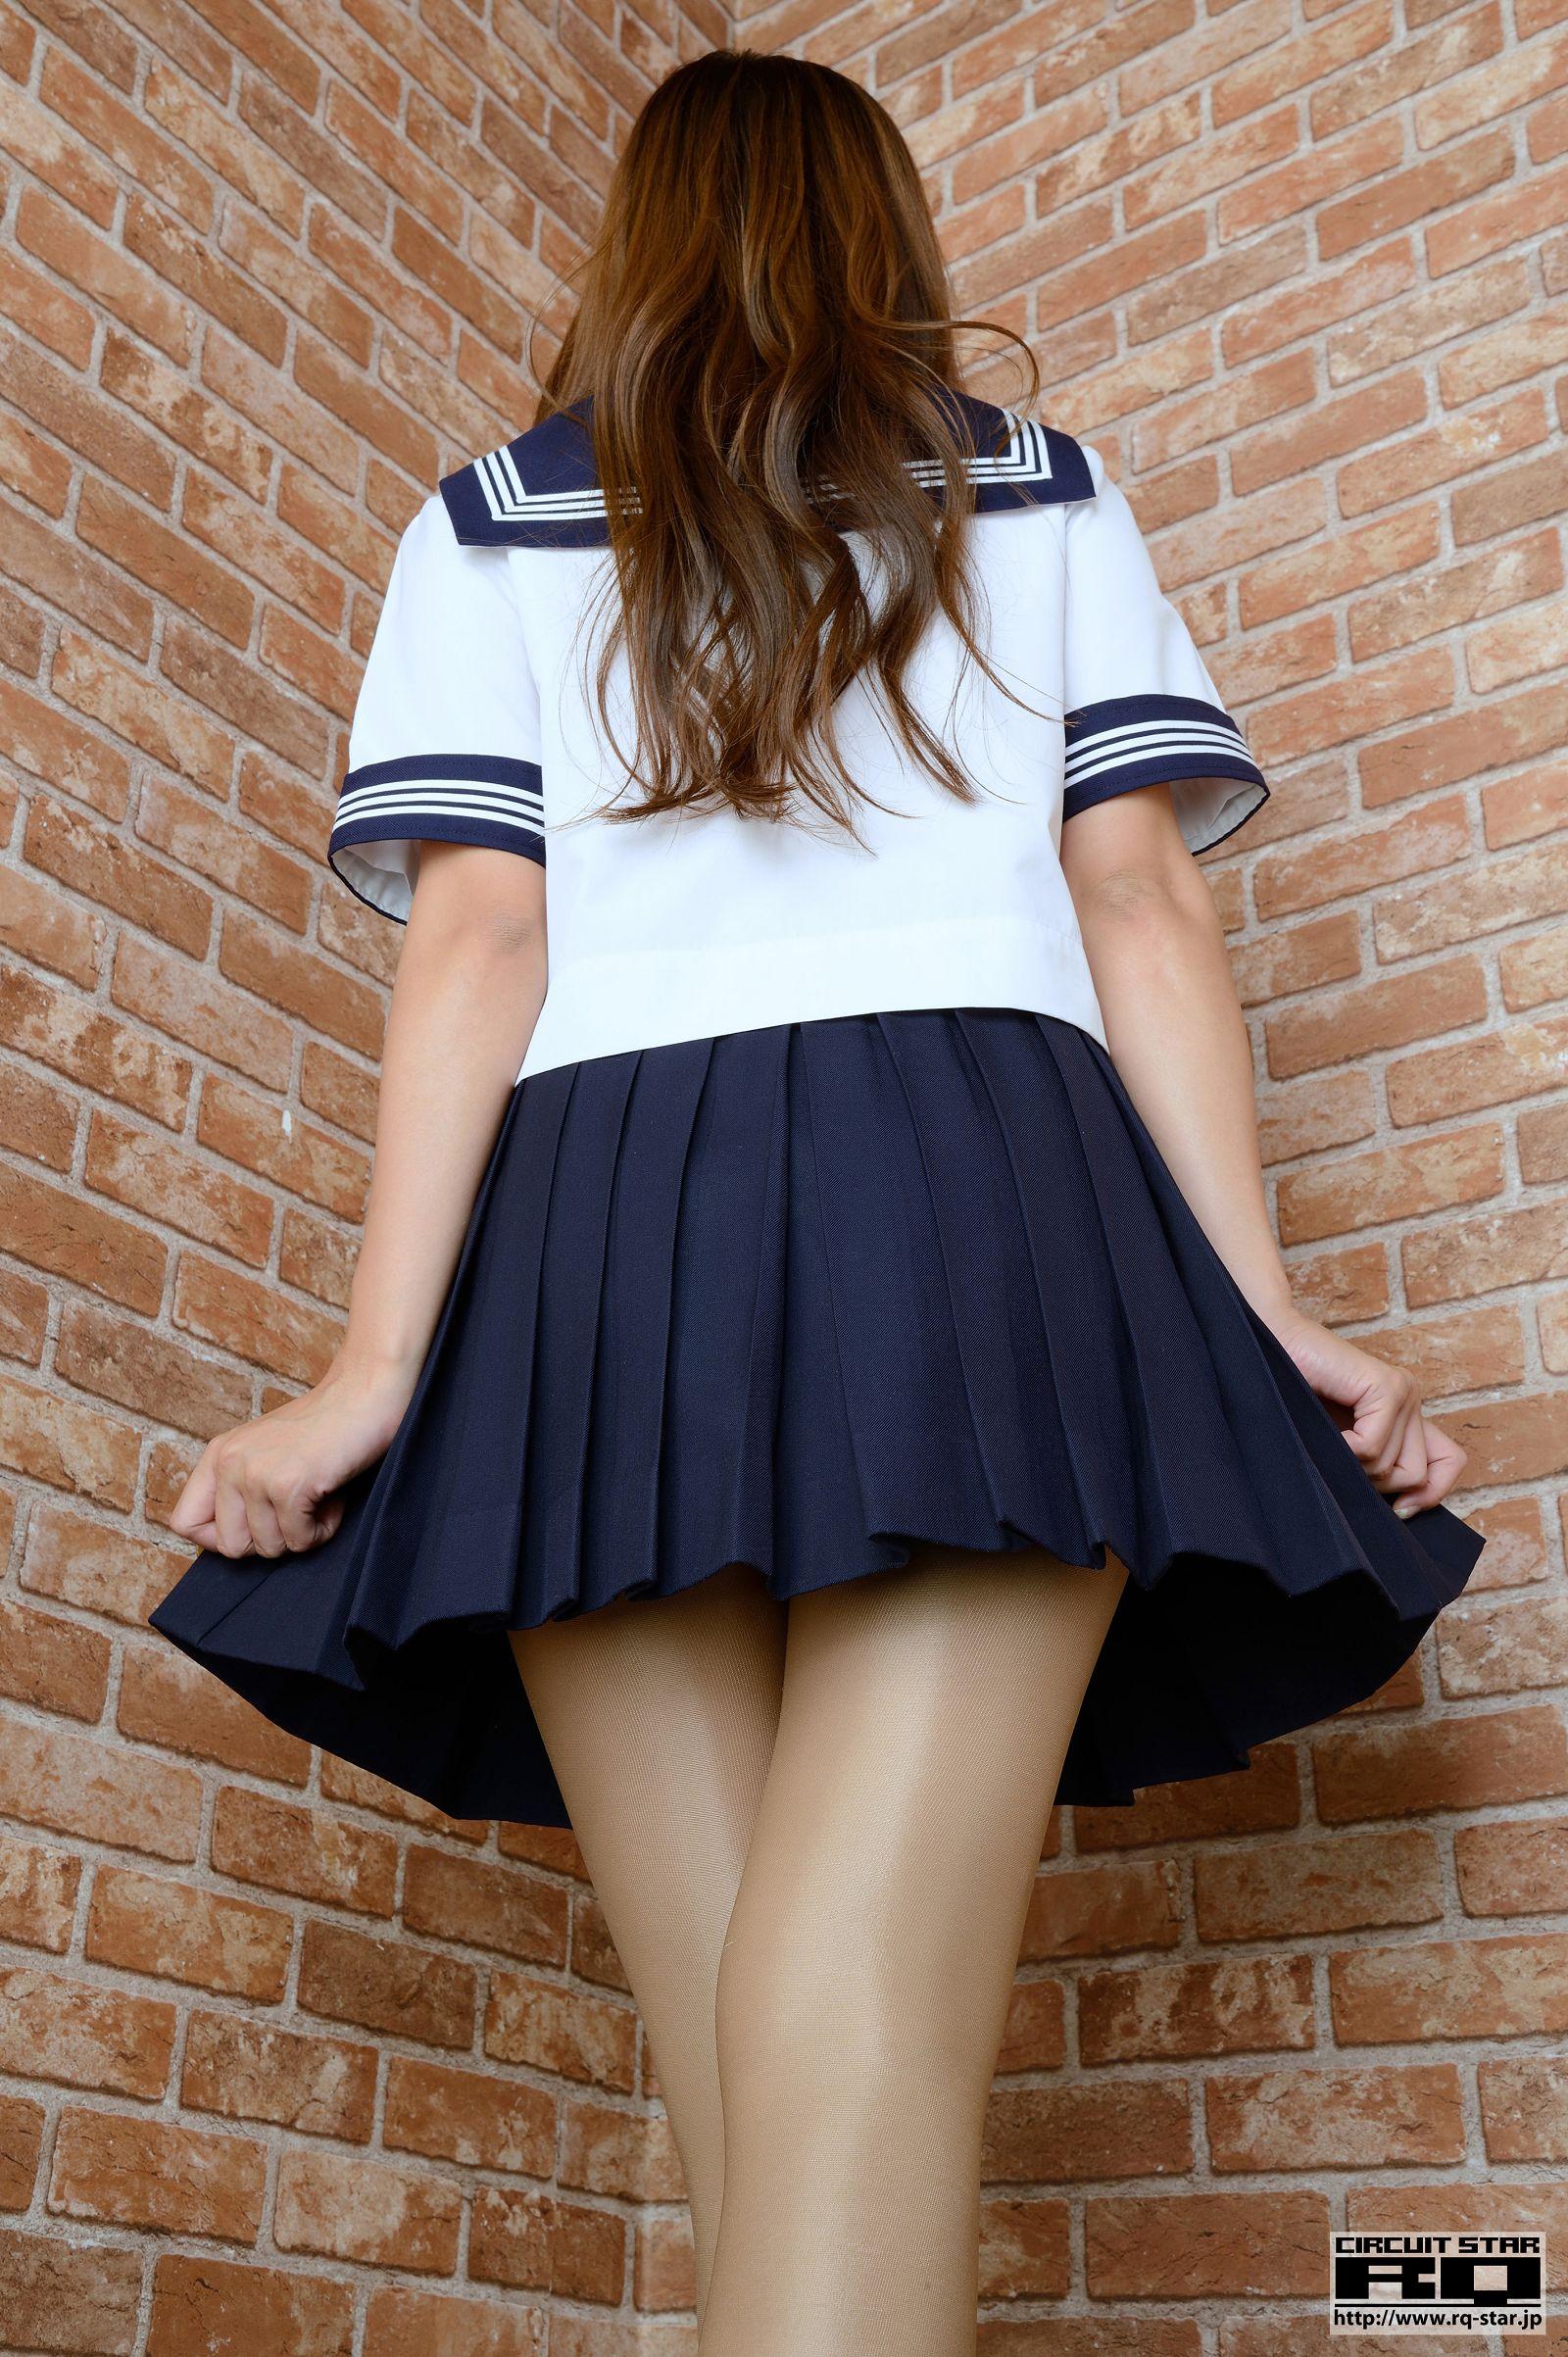 [RQ STAR美女] NO.00839 Marina Kashiwagi 柏木まりな Sailor Style[70P] RQ STAR 第2张